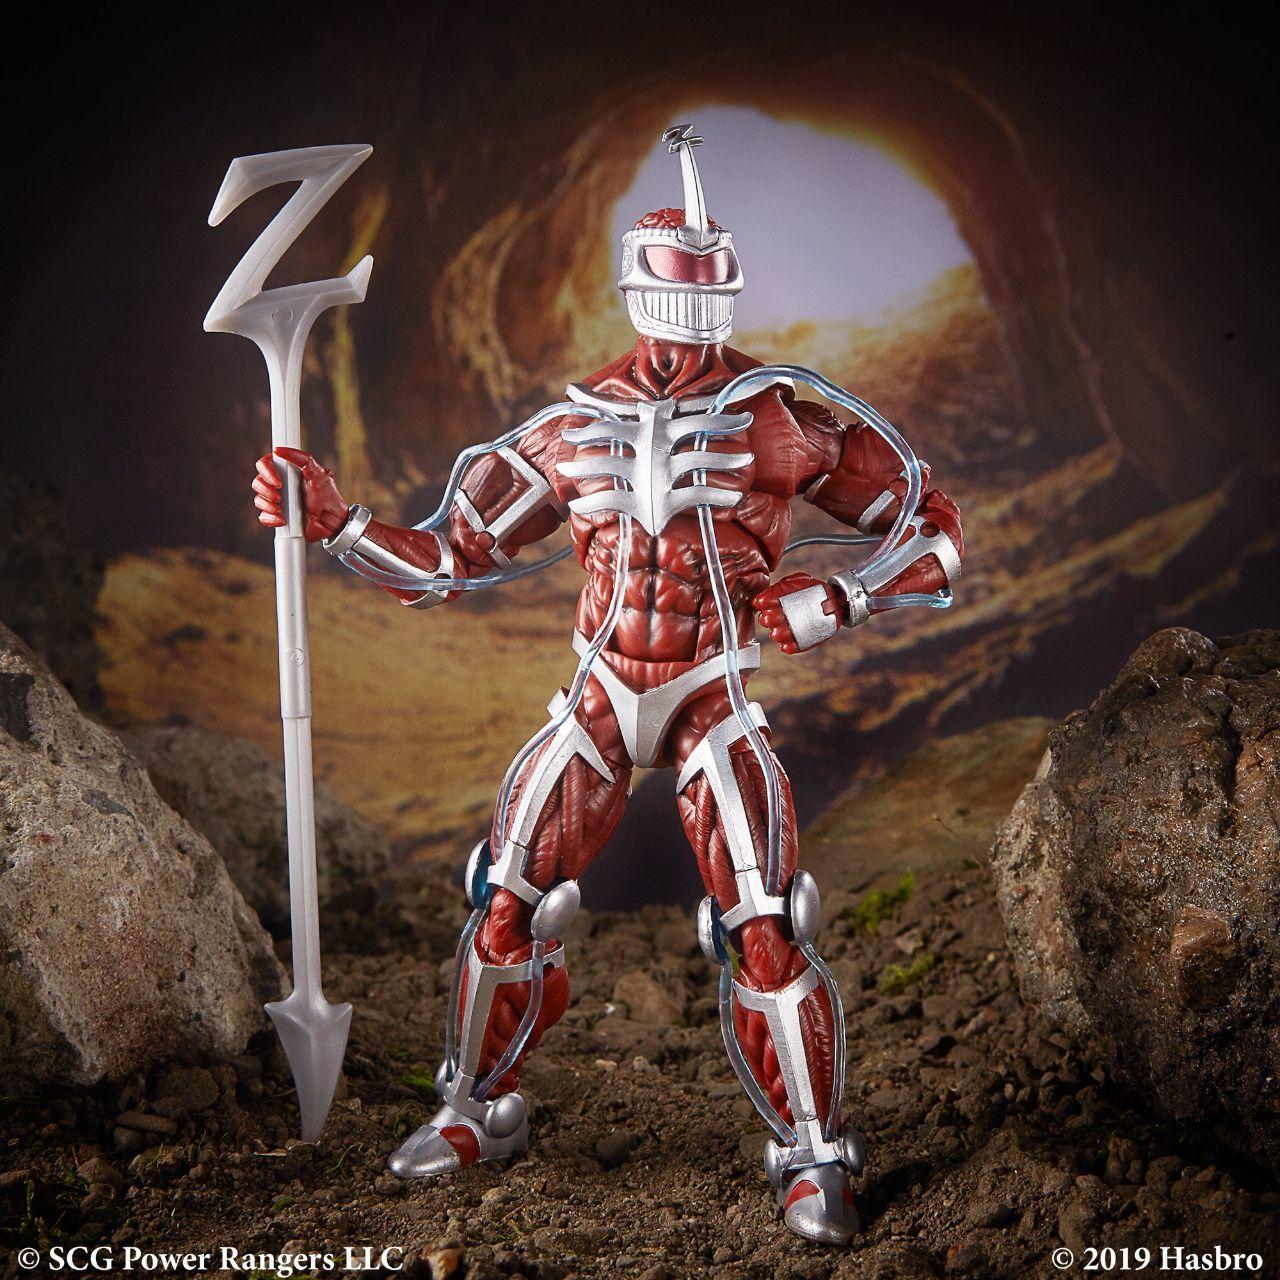 Power-Rangers-Lightning-Collection-Lord-Zedd-2